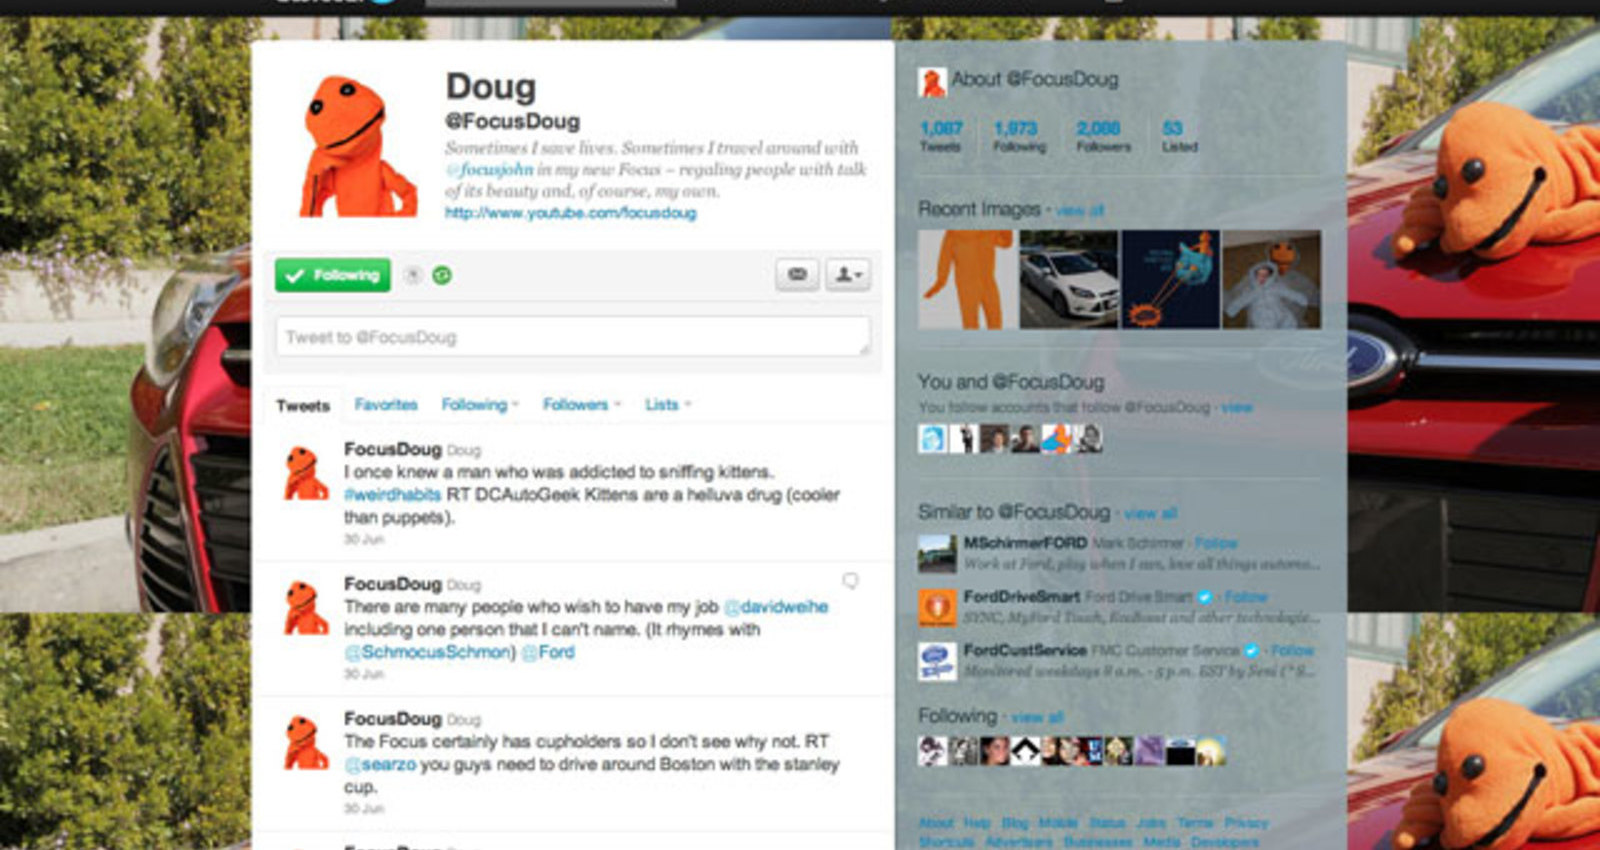 Doug, the Orange Spokespuppet